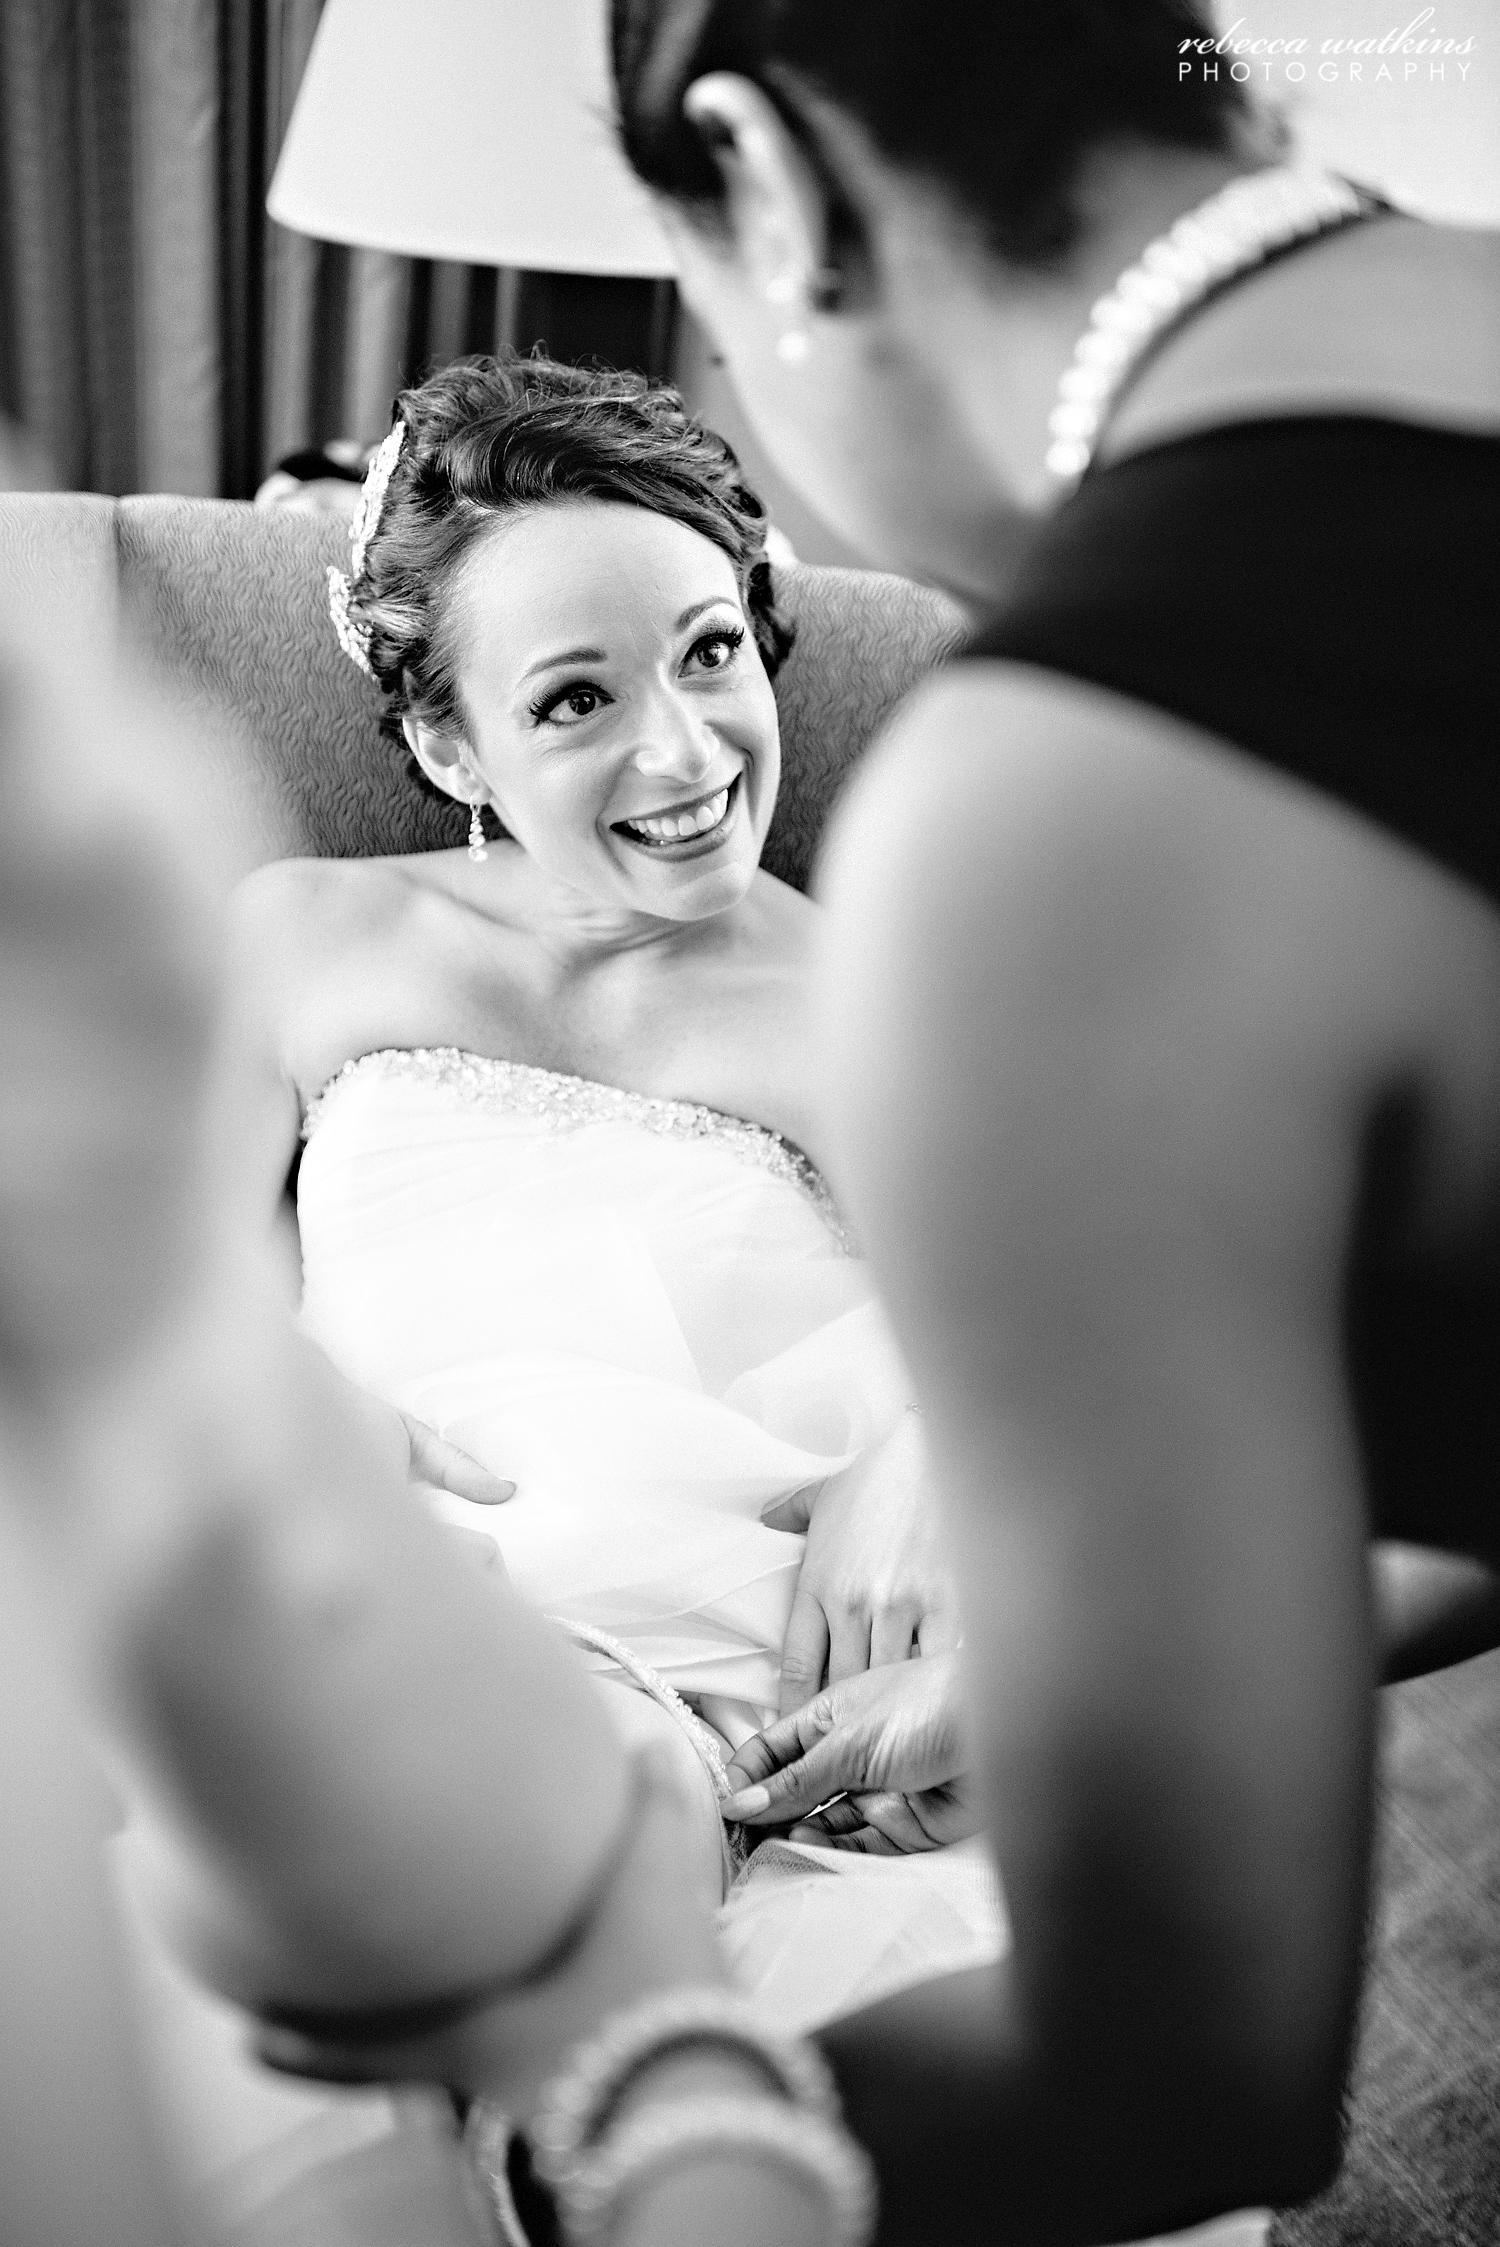 rebeccawatkinsphotographycarlylealexandriawedding-27.jpg